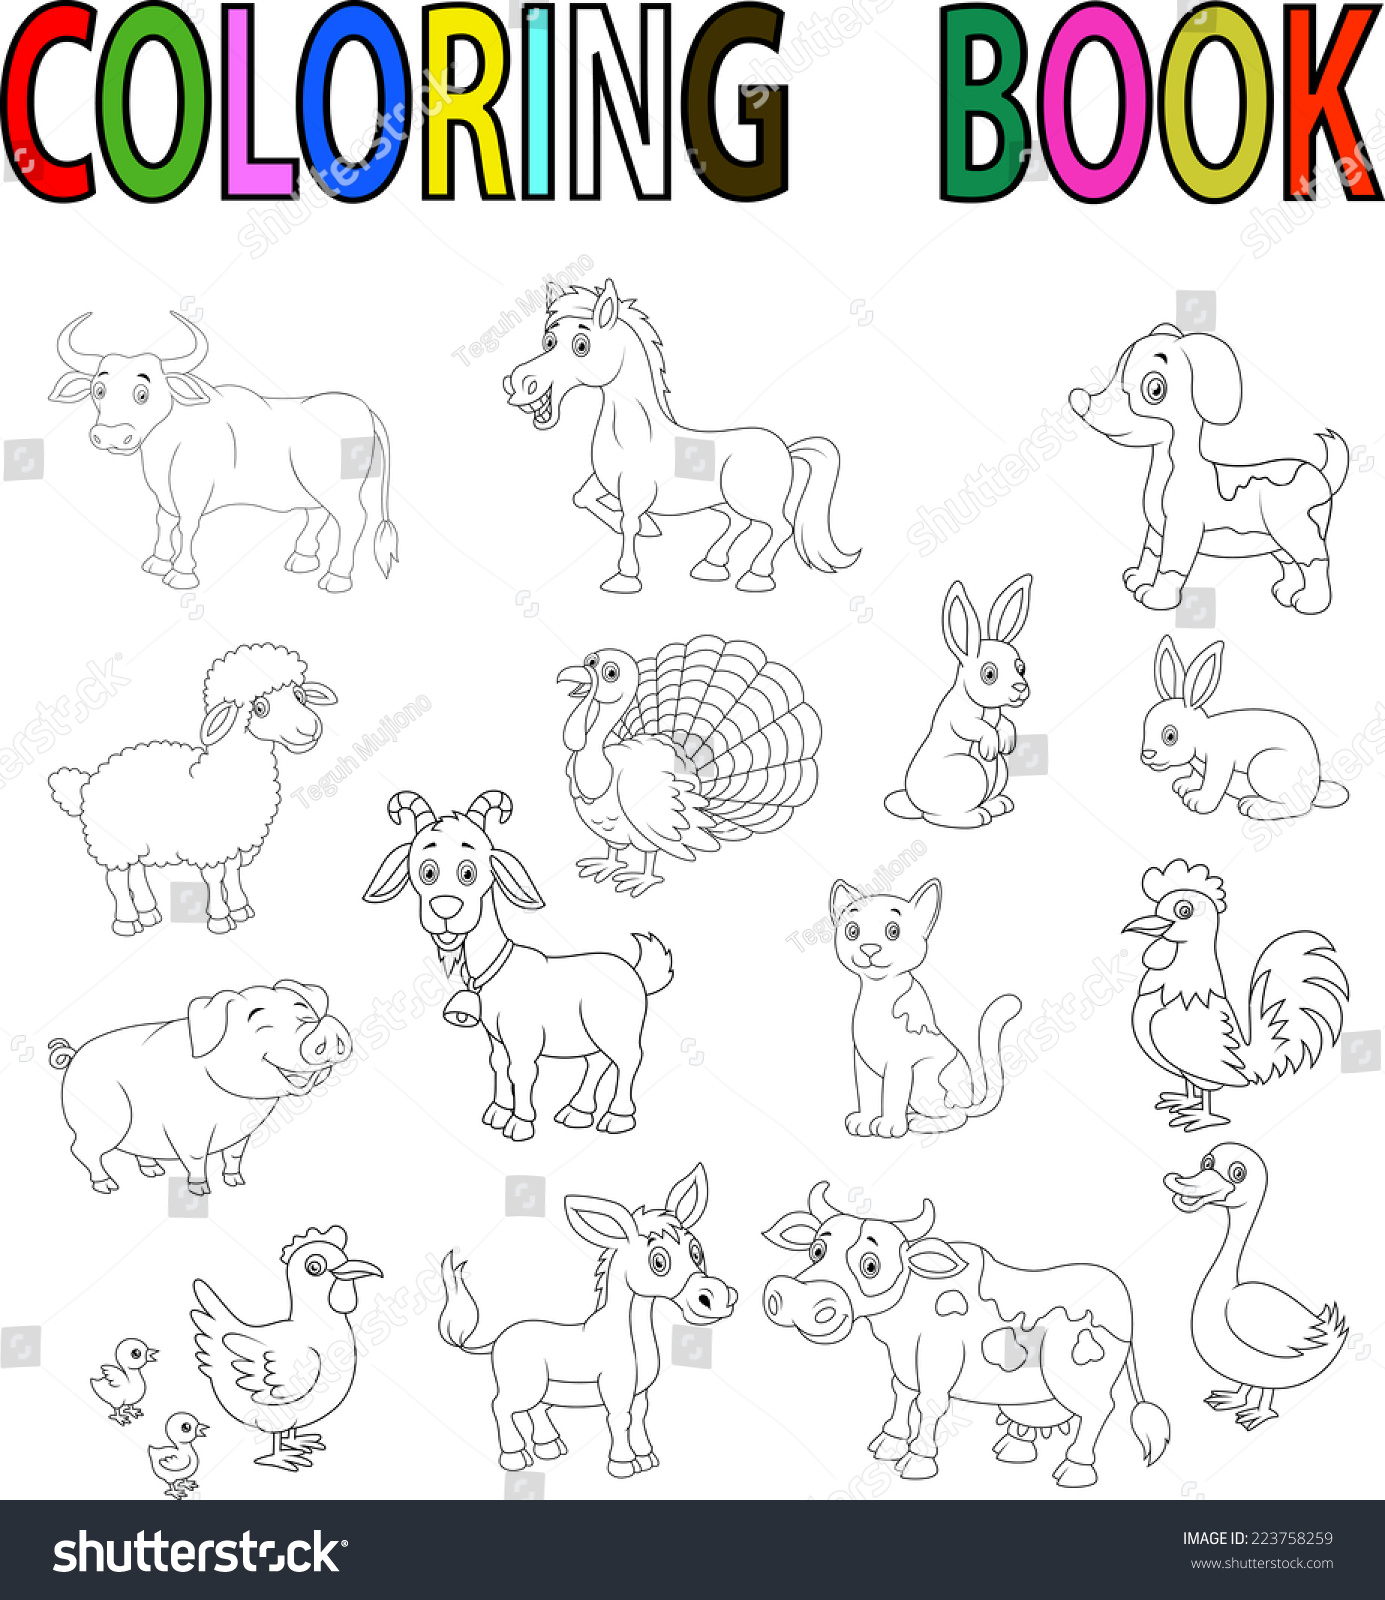 Farm Animal Coloring Book Stock Vector 223758259 - Shutterstock